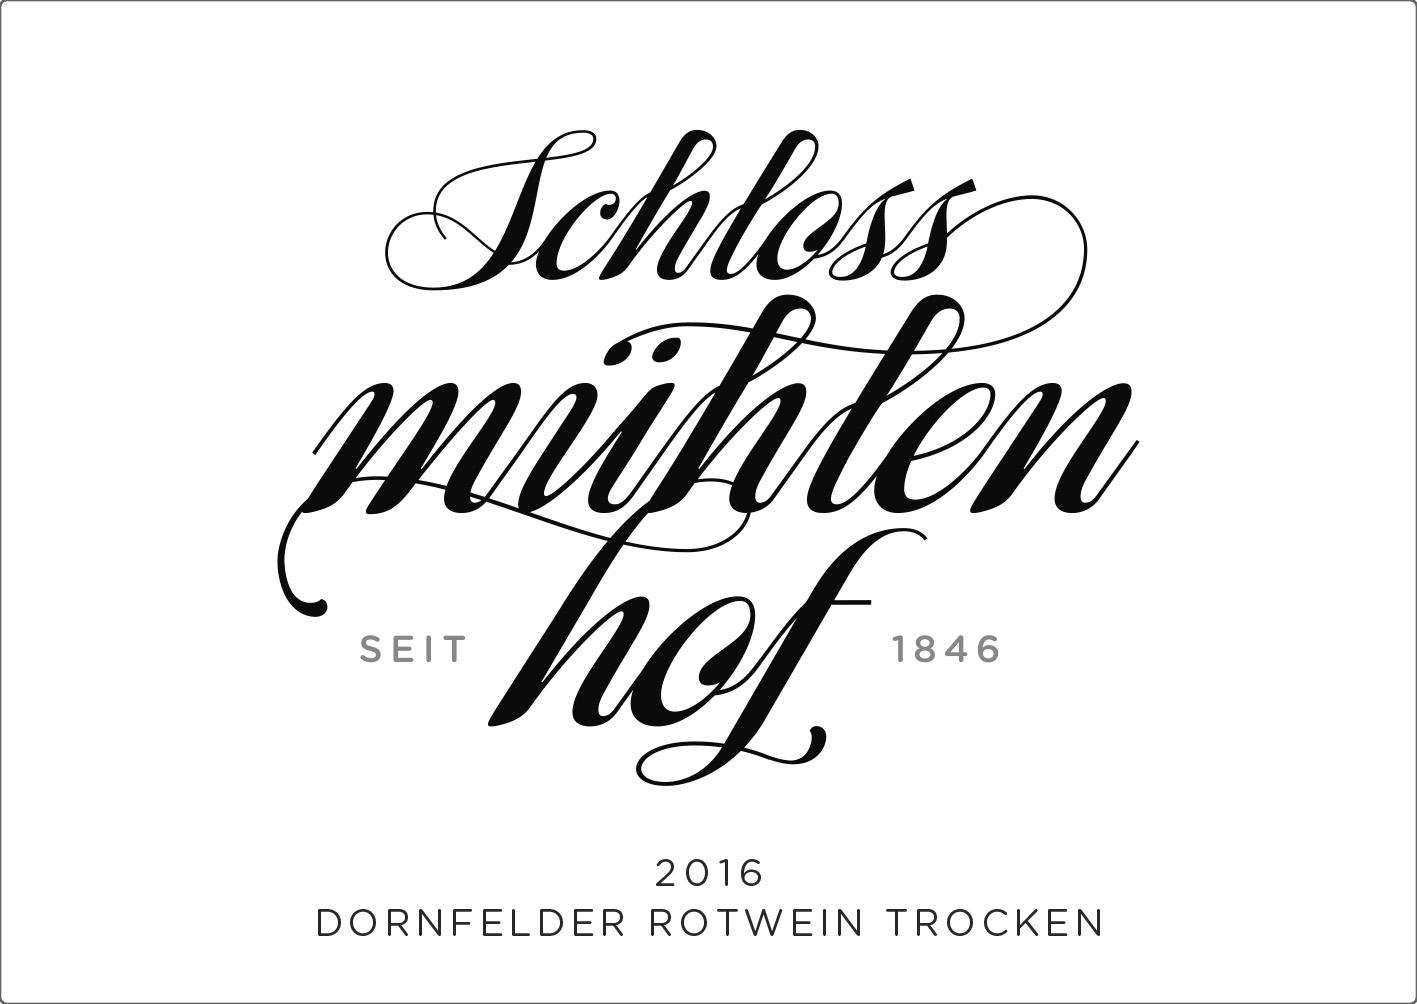 VE_Dornfelder_Rotwein_trocken_2016.jpg